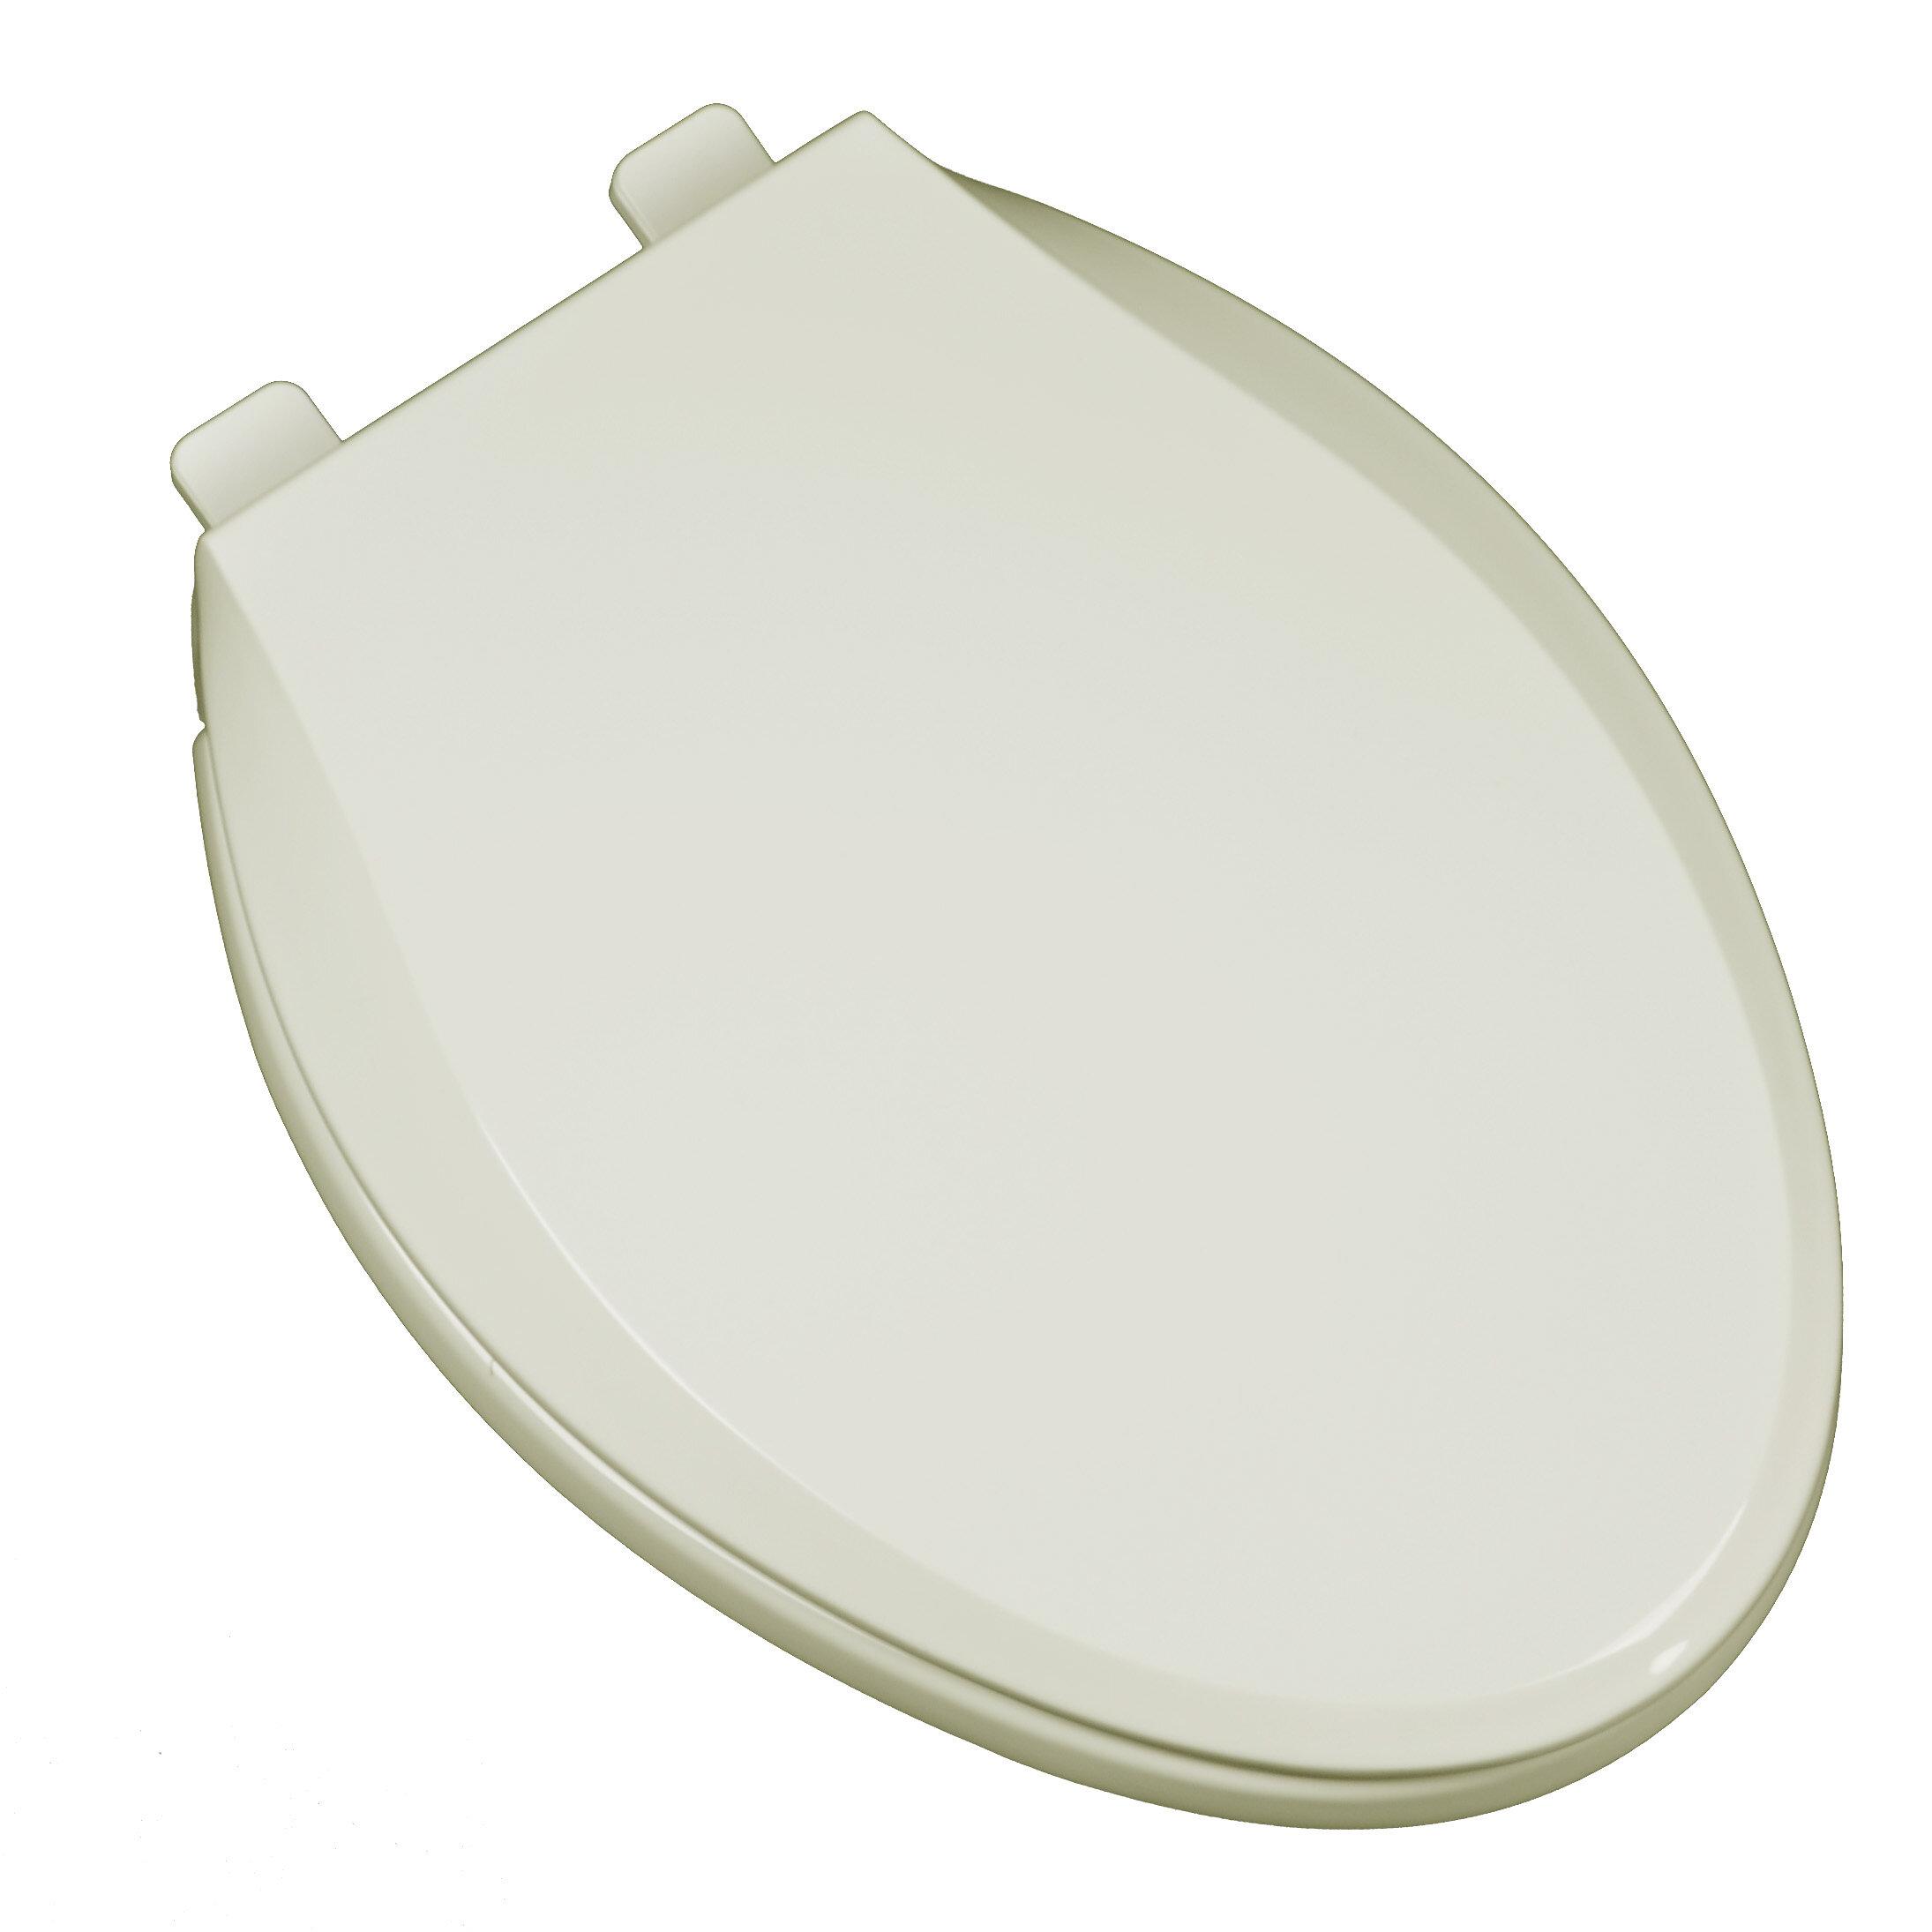 BRAND NEW LUXURY BATHROOM SLOW CLOSE OVAL SHAPE TOILET SEAT WC HEAVY DUTY WHITE